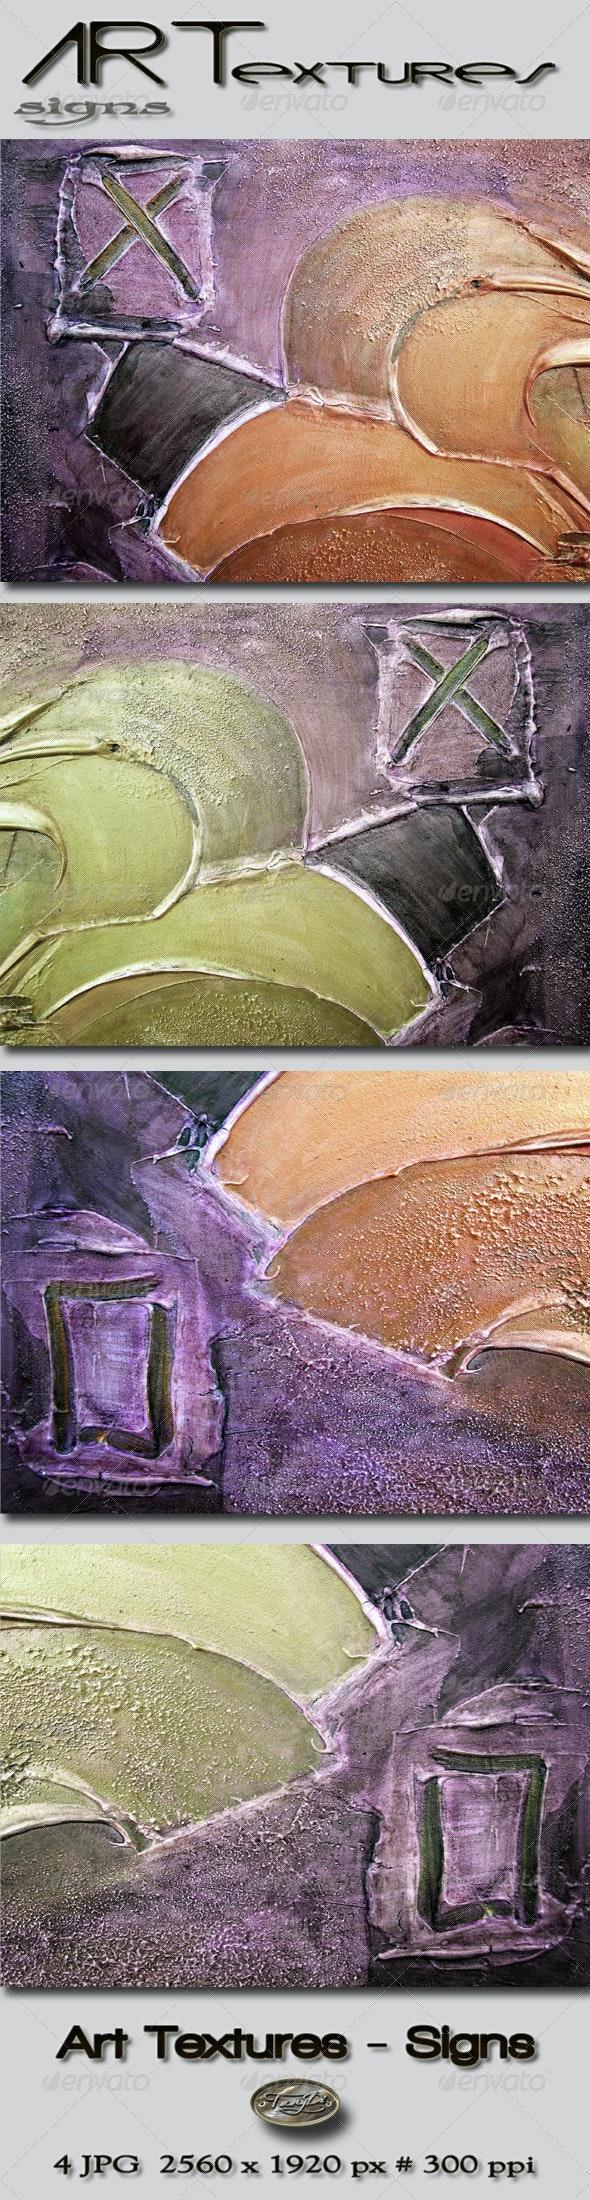 Art Textures - Signs - Art Textures